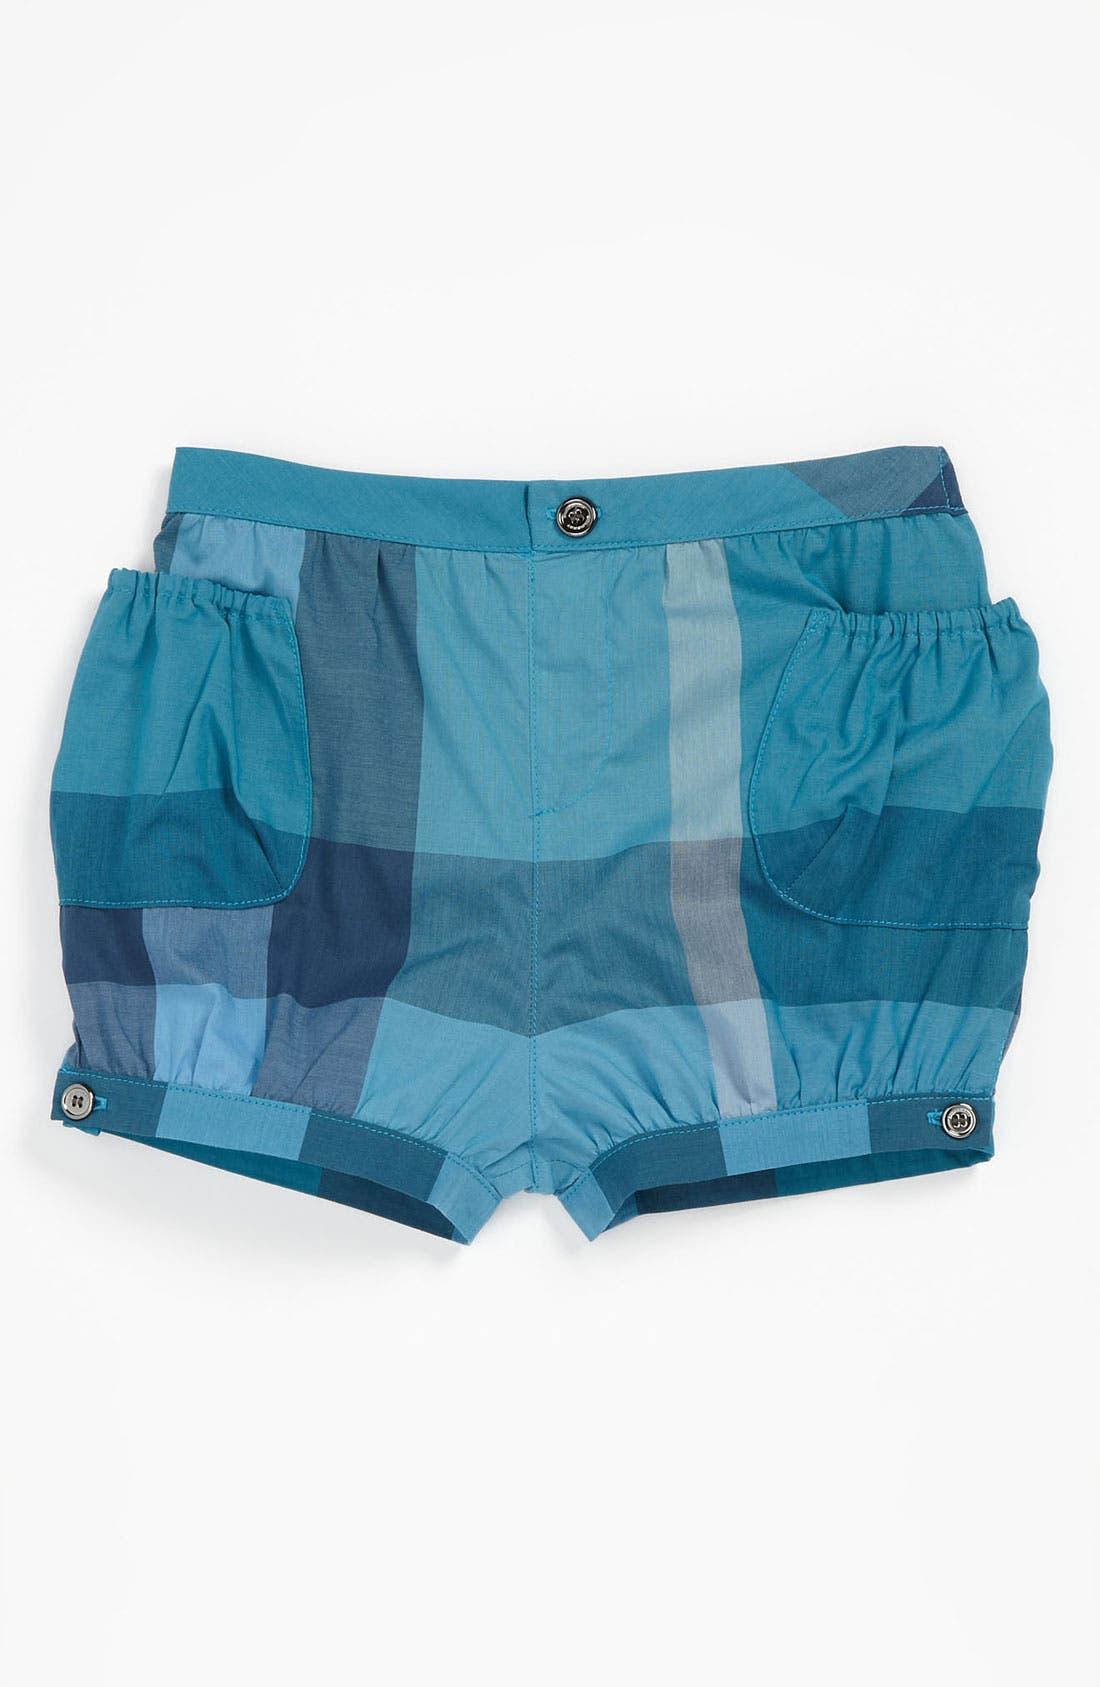 Main Image - Burberry 'Meghan' Shorts (Baby)